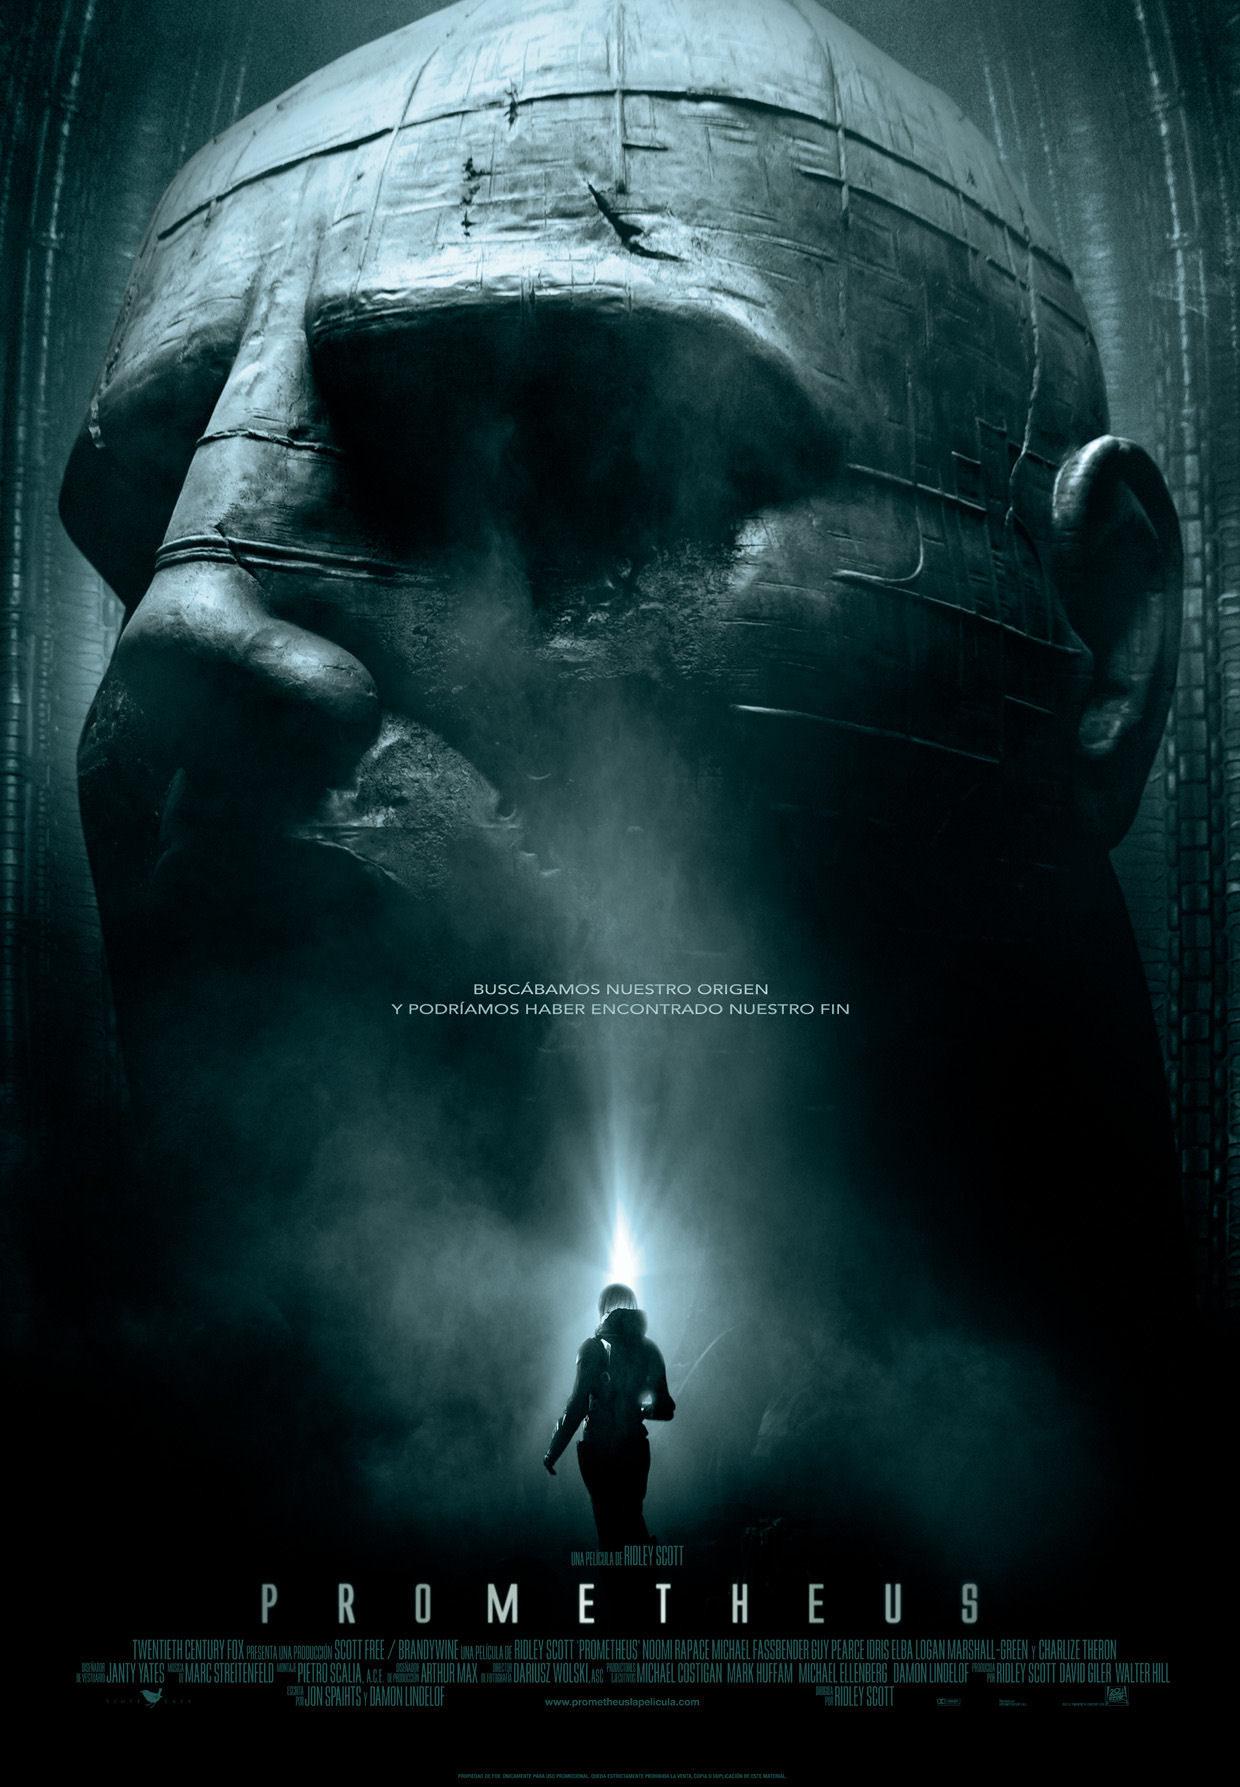 Cartel de la película Prometheus, de Ridley Scott